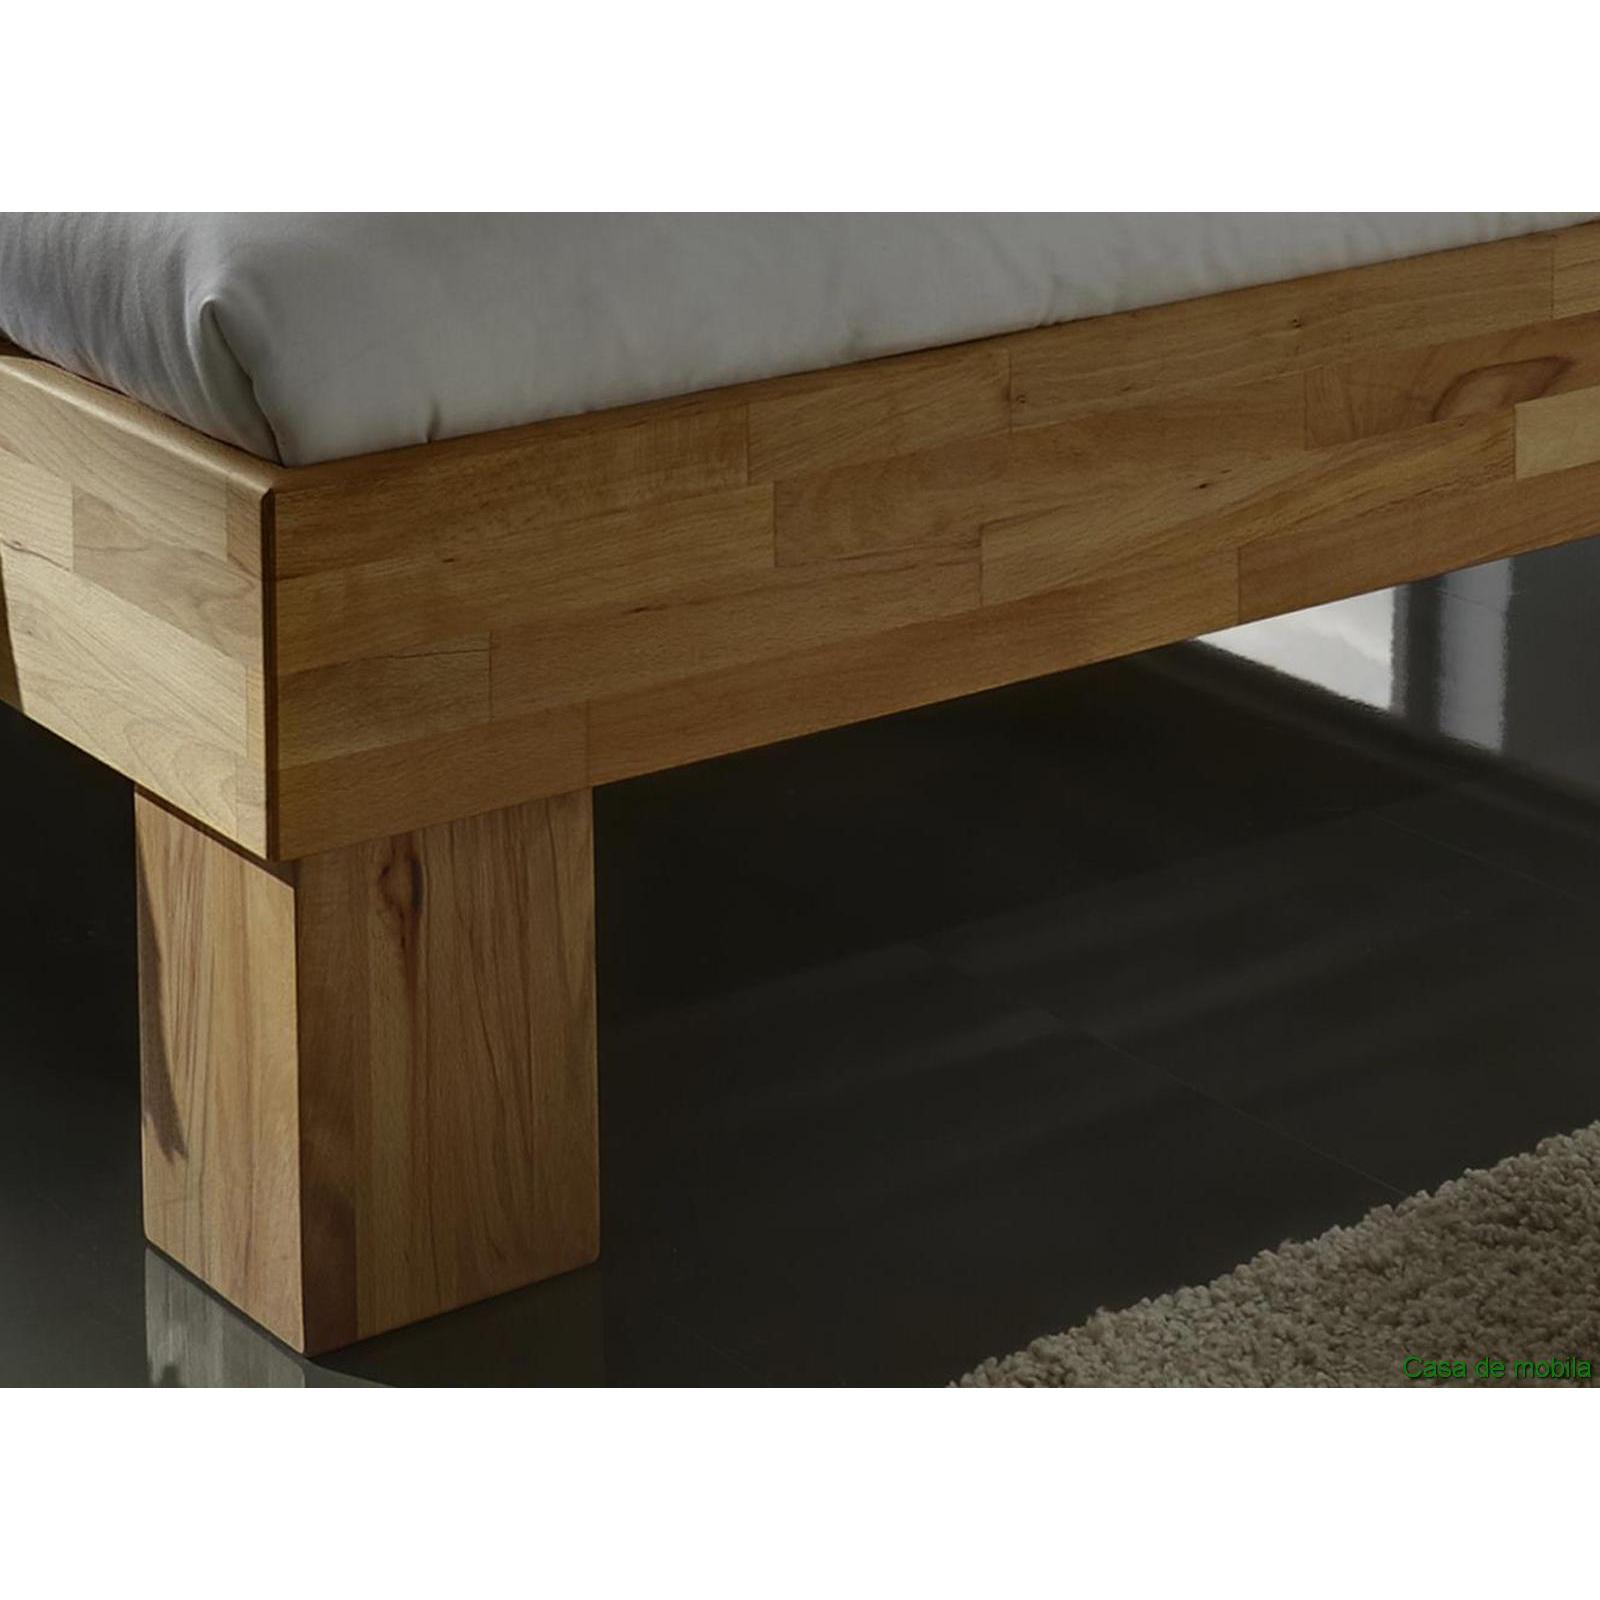 echtholz doppelbett kernbuche massiv ge lt gamma bett 160x200. Black Bedroom Furniture Sets. Home Design Ideas